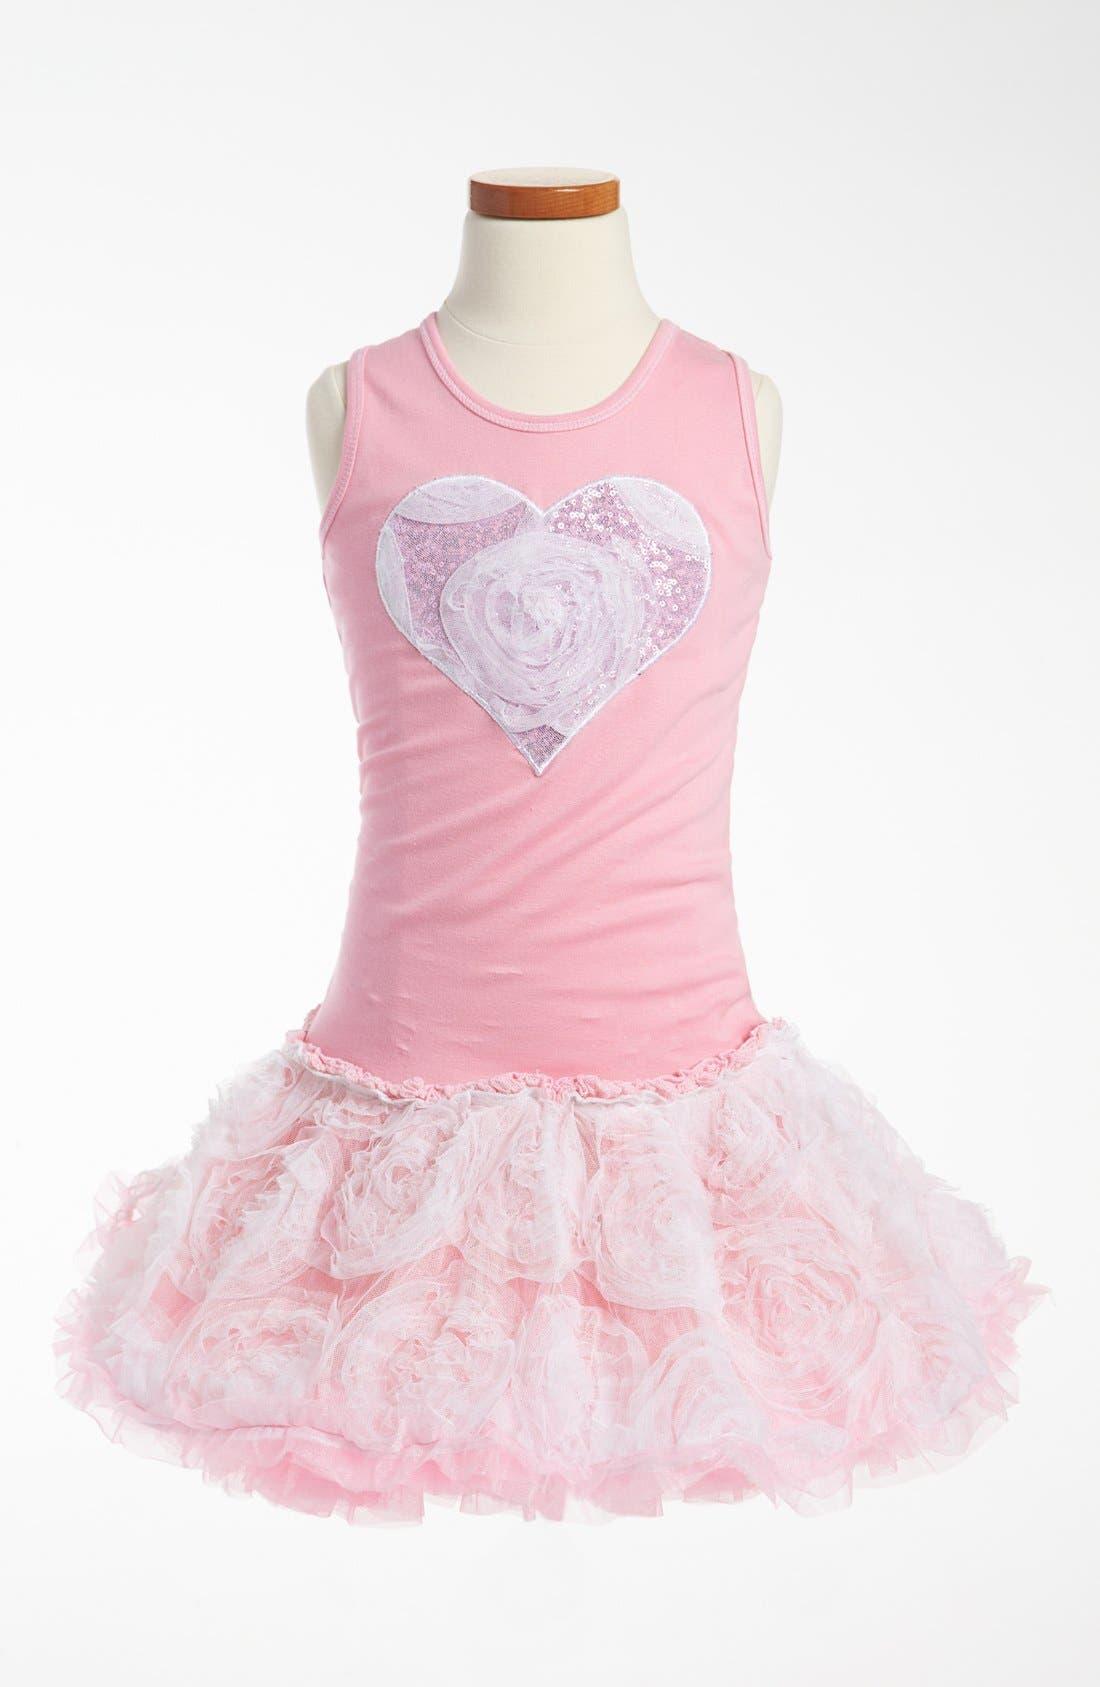 Alternate Image 1 Selected - Ooh! La, La! Couture Tulle Flower Dress (Little Girls & Big Girls)